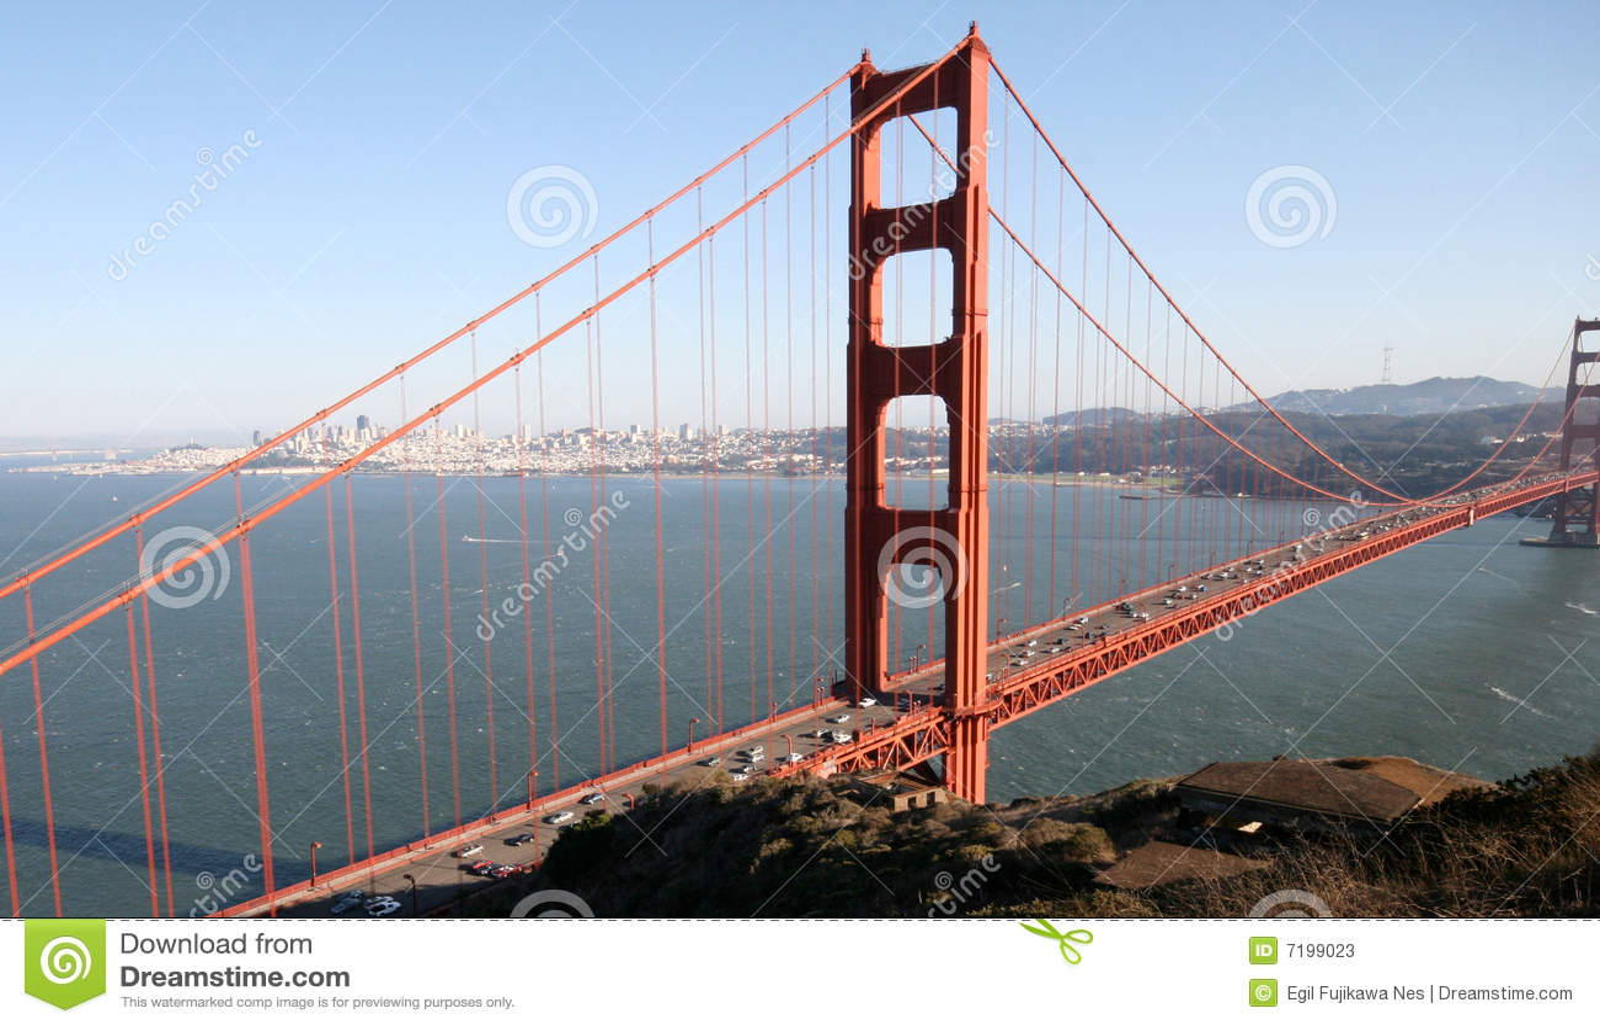 Golden gate landscape stock photos image 7199023 for San francisco landscape